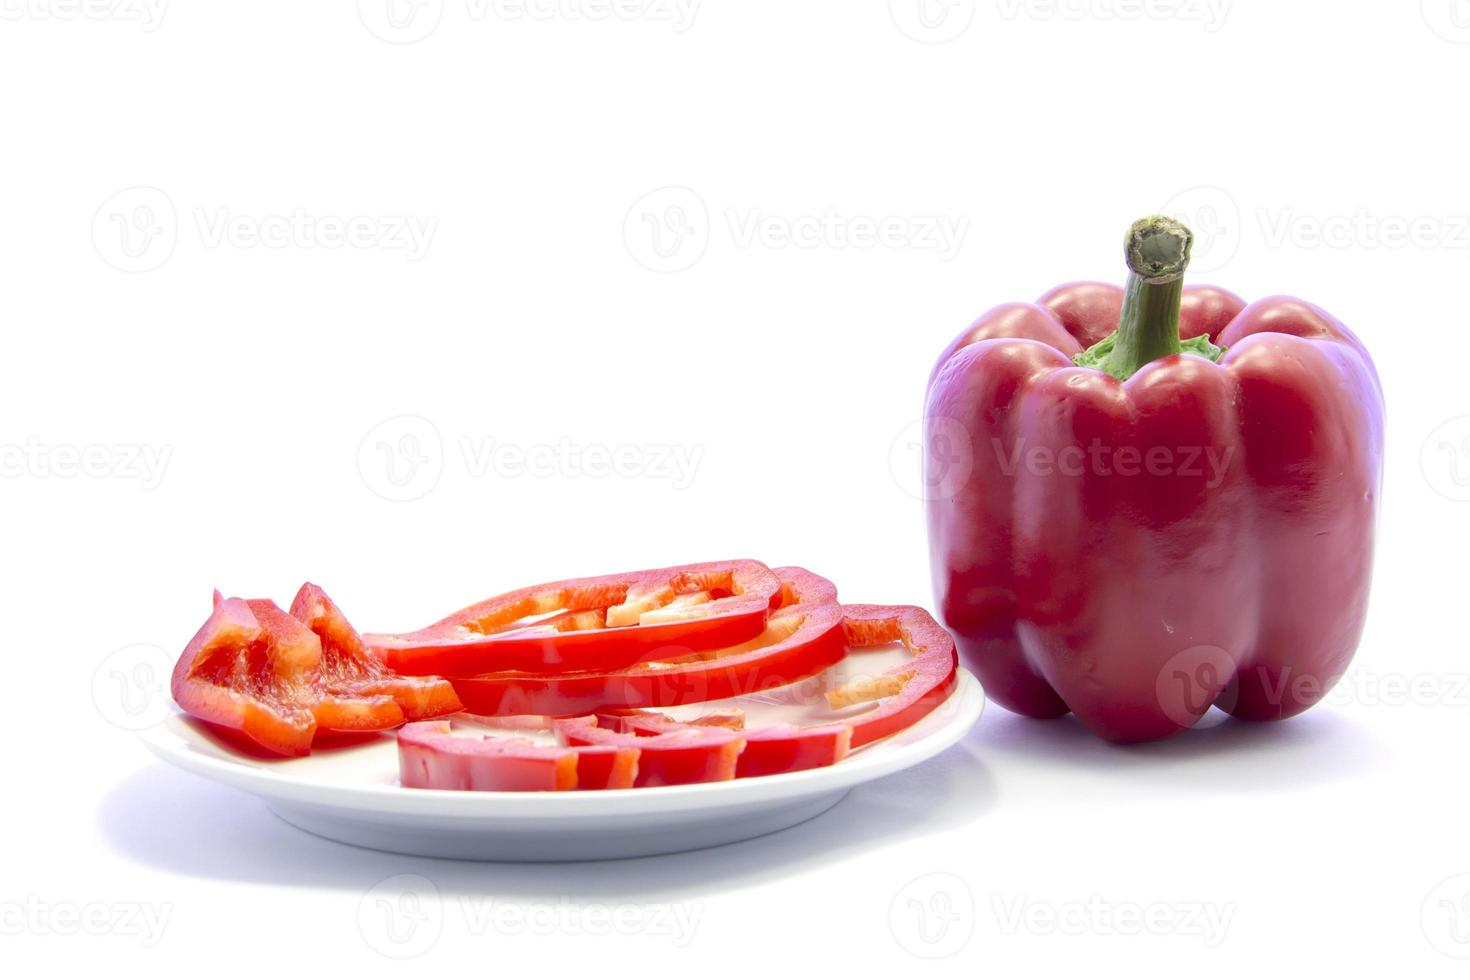 Red Bell Chili verschiedene geschnittene Kochzutat mit rohem Kumpel foto